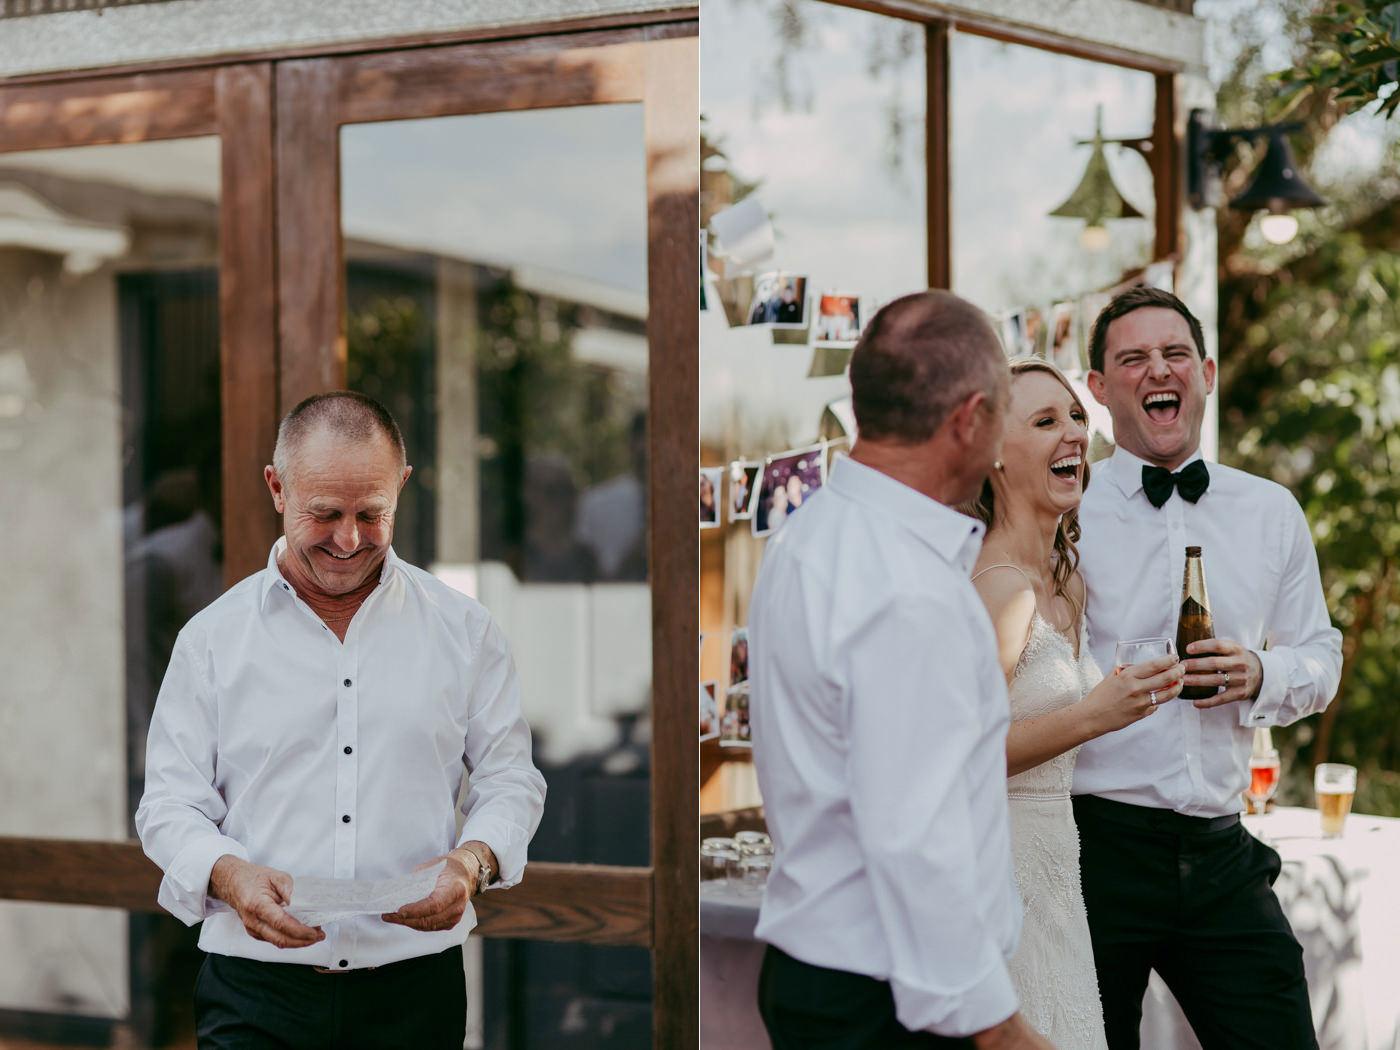 Anthony & Eliet - Wagga Wagga Wedding - Country NSW - Samantha Heather Photography-123.jpg